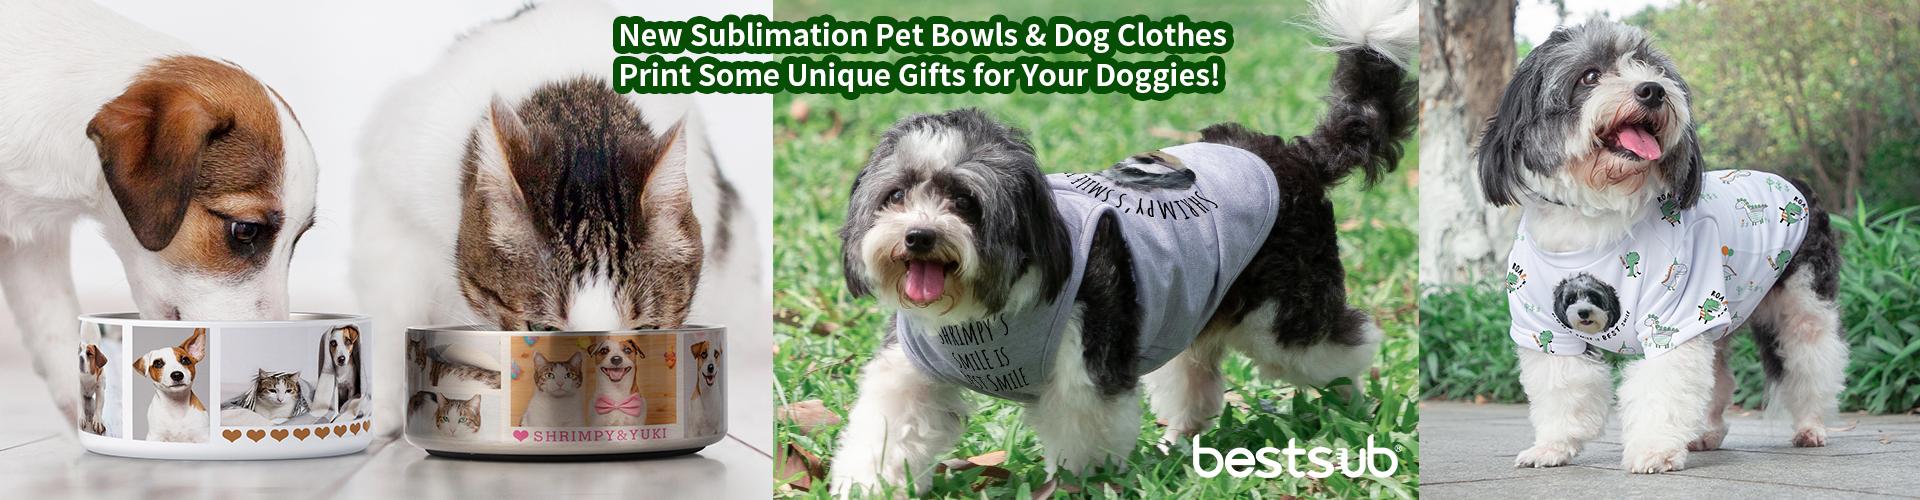 2021-05-10_New_Sublimation_Dog_Clothes_Pet_Bowls_new_web